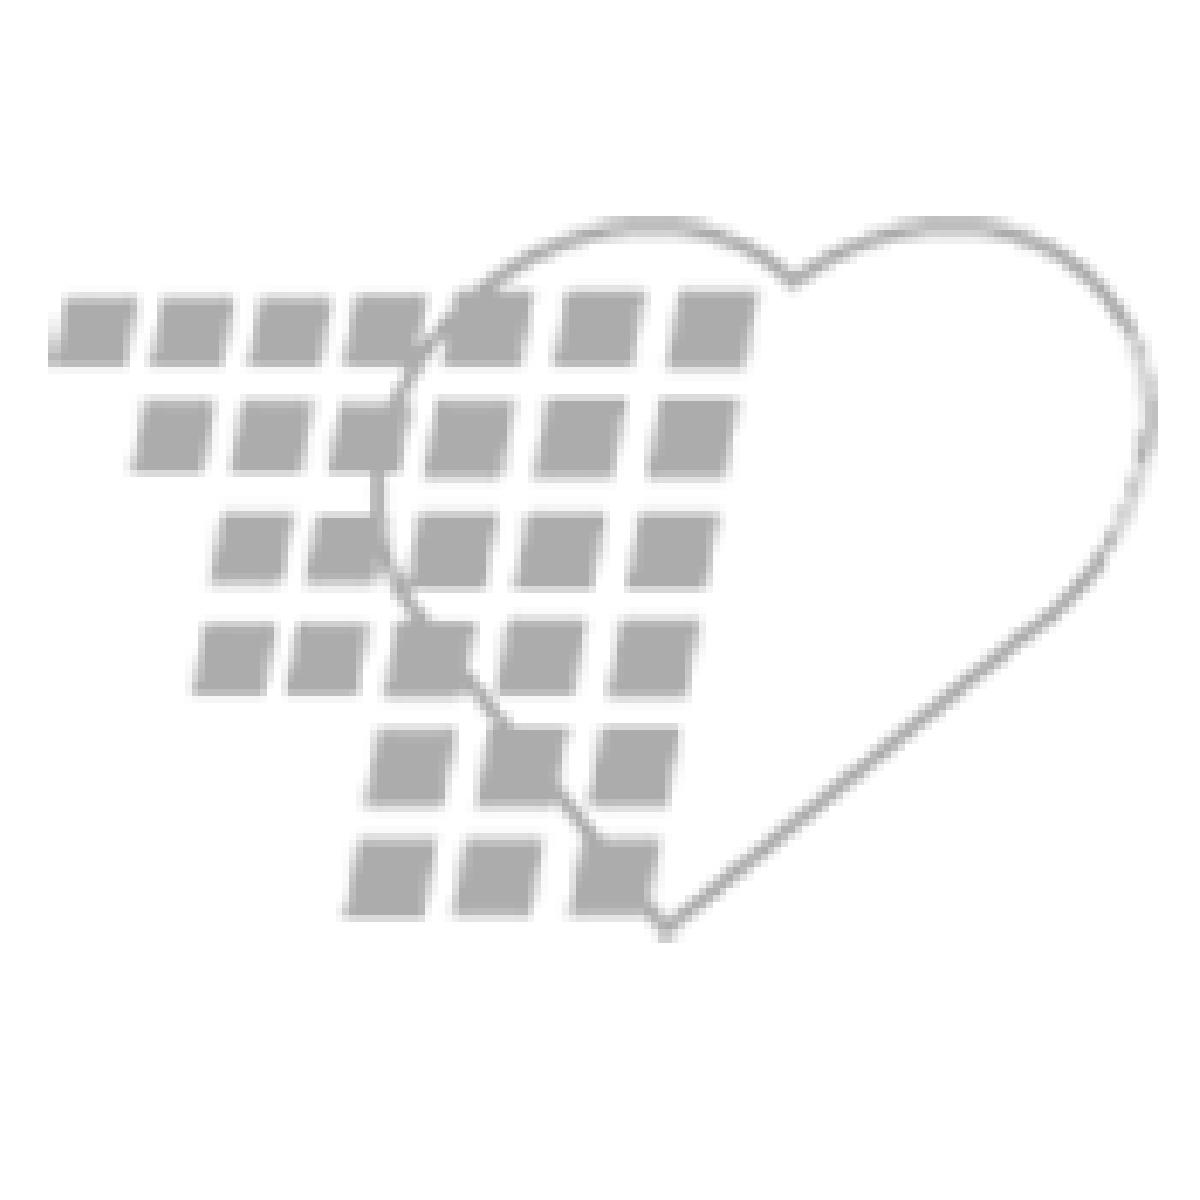 07-71-0008 - Shiley Tracheostomy Tube #8 - Cuffless with Inner Cannula